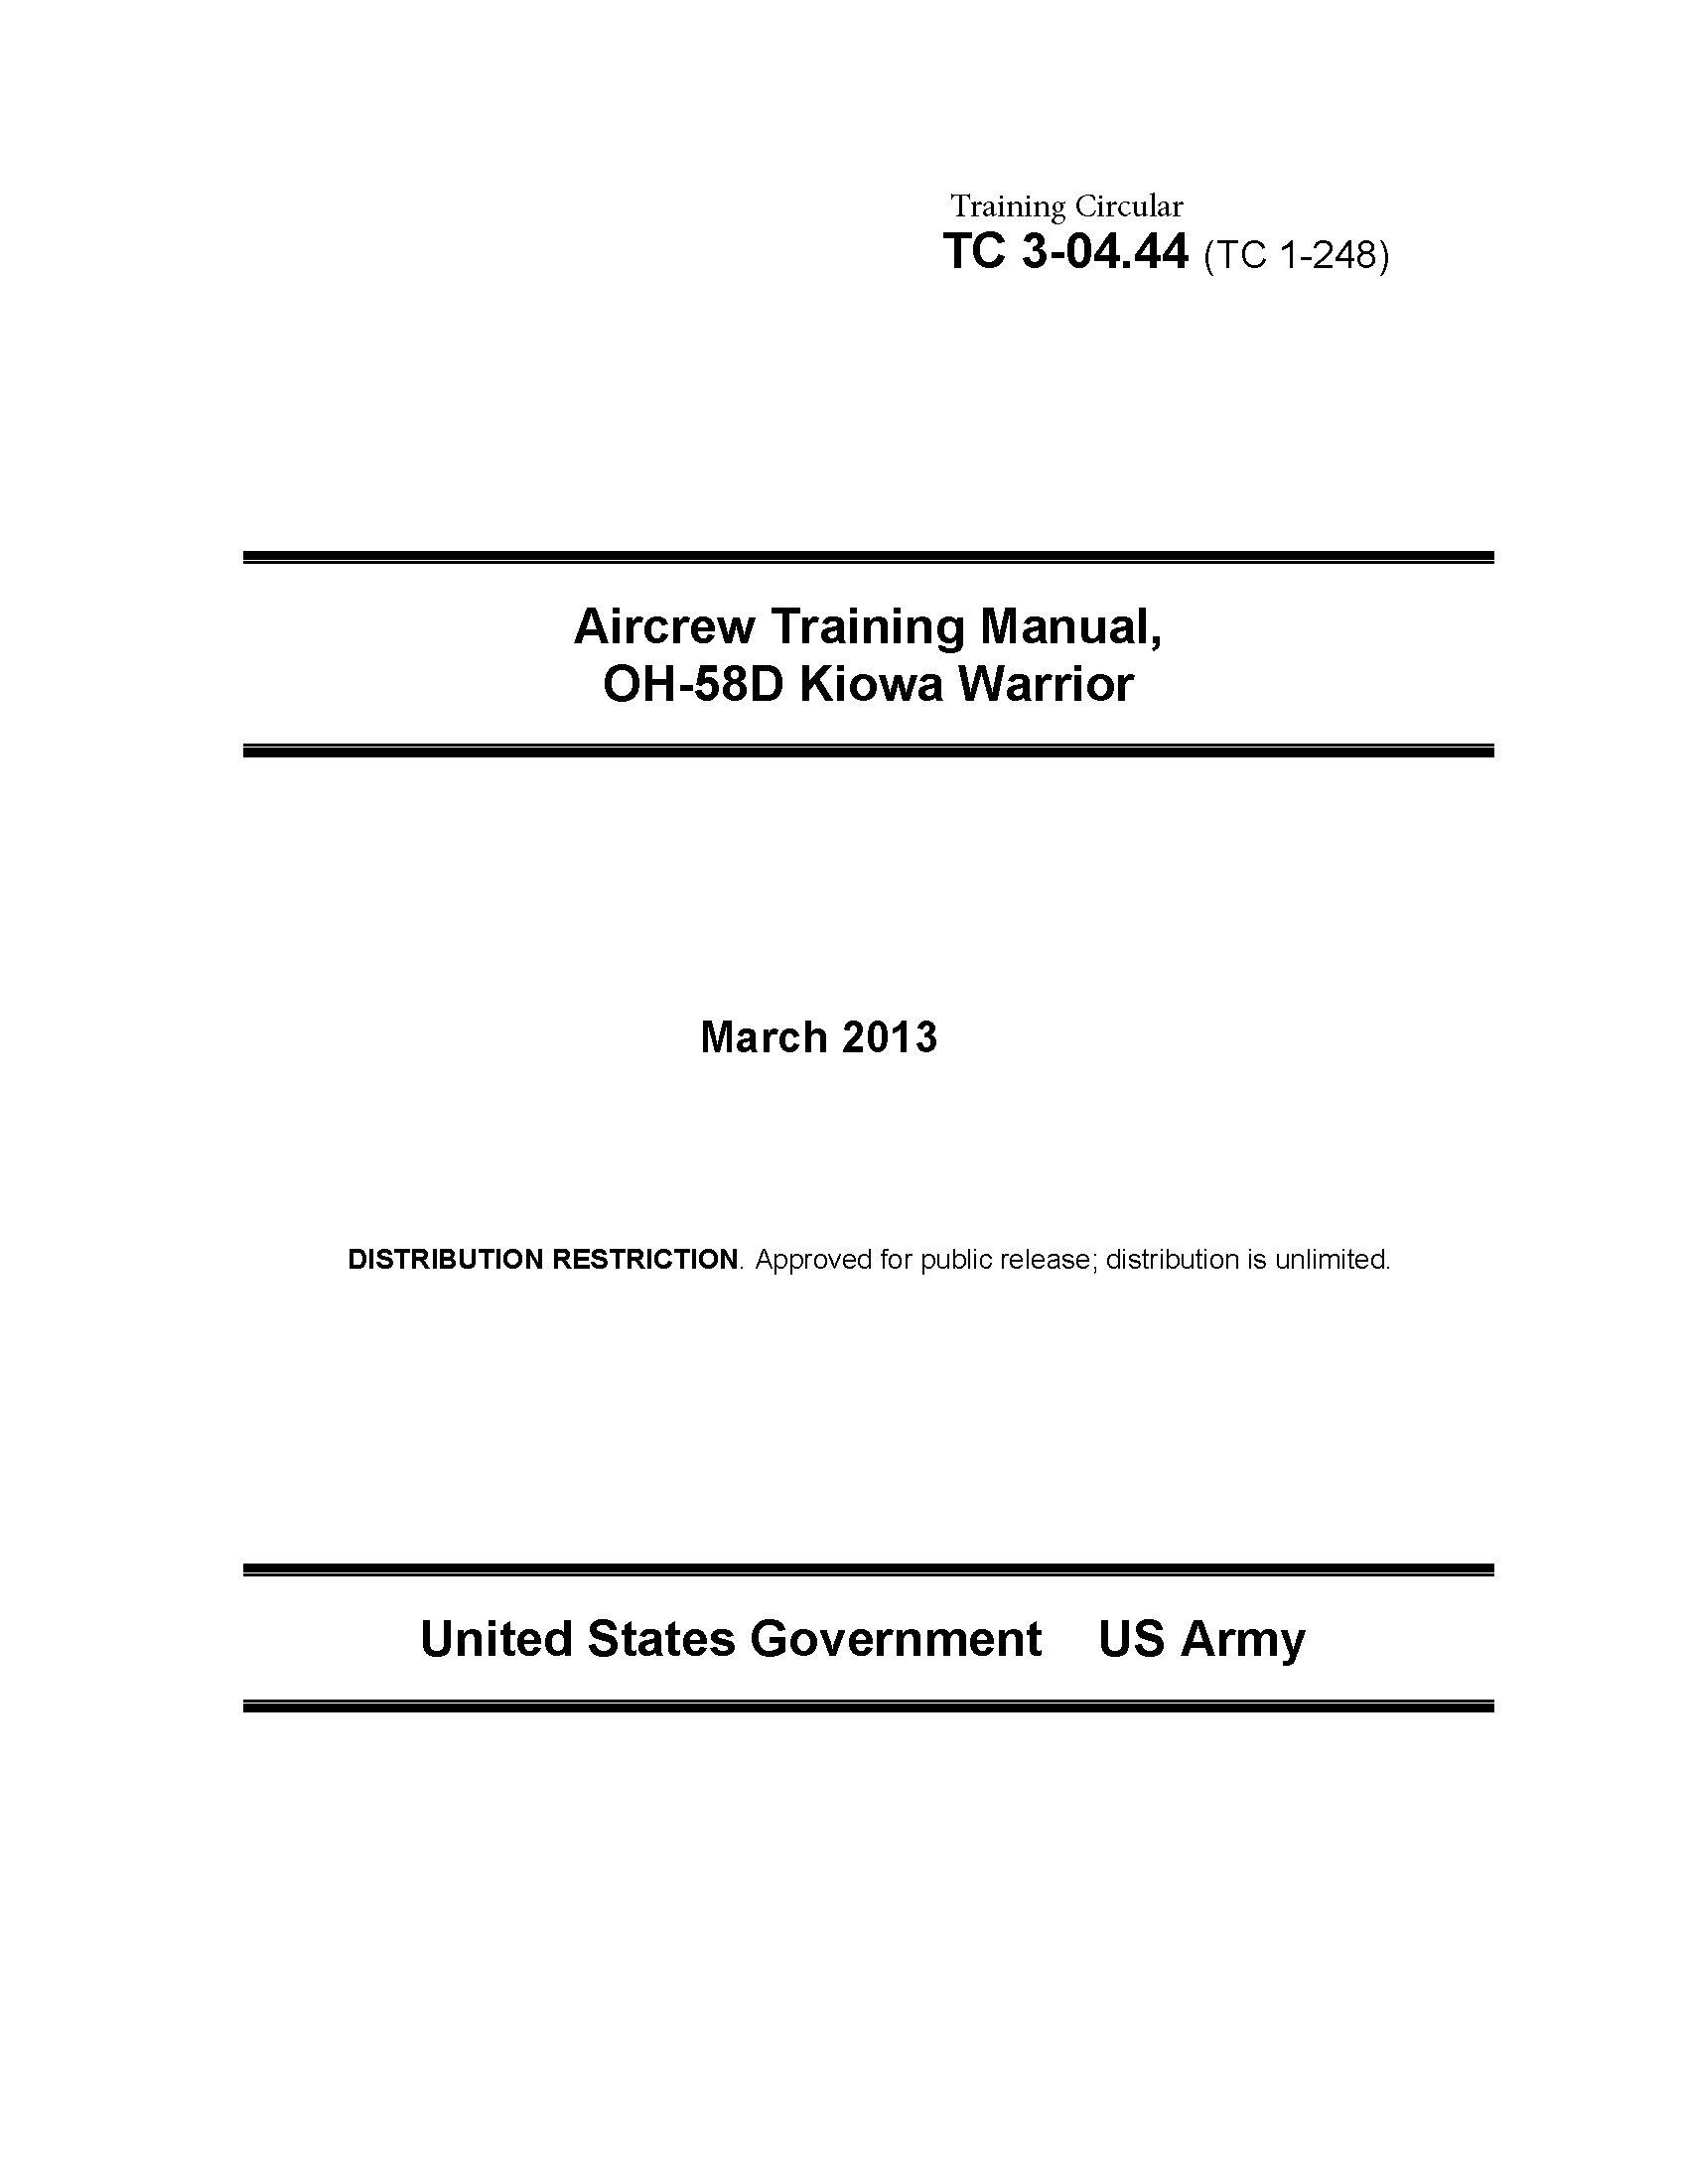 Training Circular TC 3 04.44  TC 1 248  Aircrew Training Manual OH 58D Kiowa Warrior March 2013  English Edition